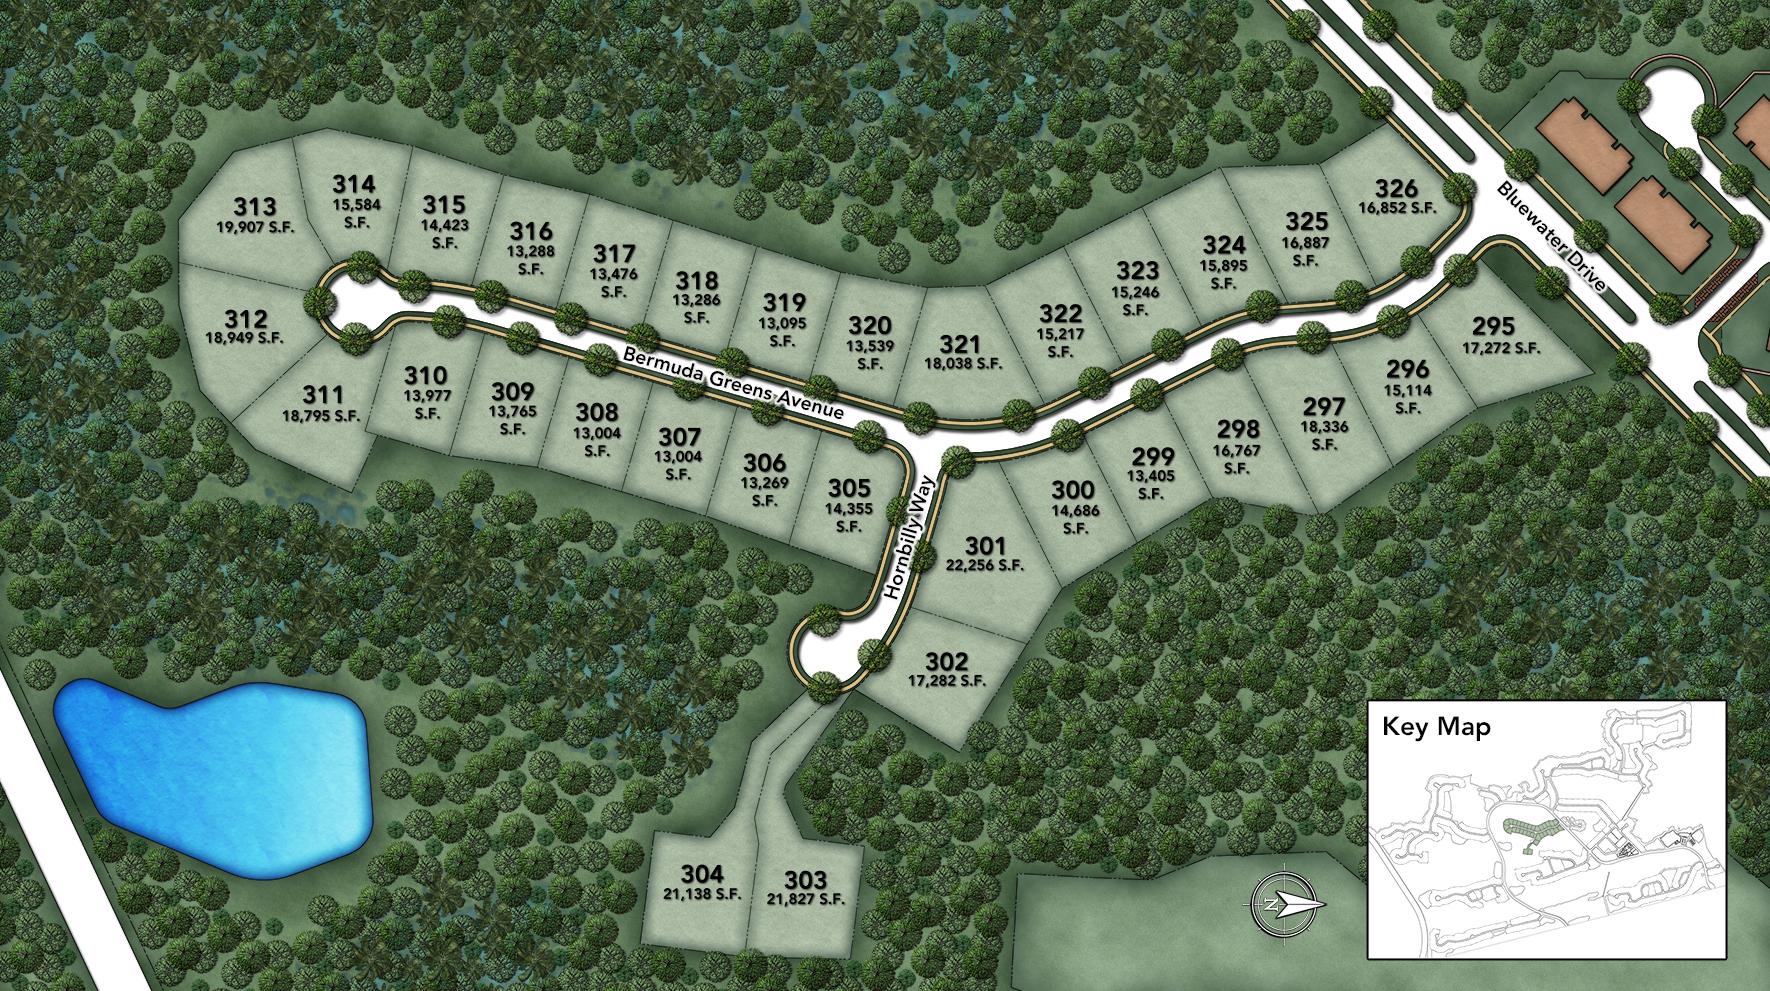 Coastal Oaks at Nocatee - Signature - Bermuda Greens Site Plan